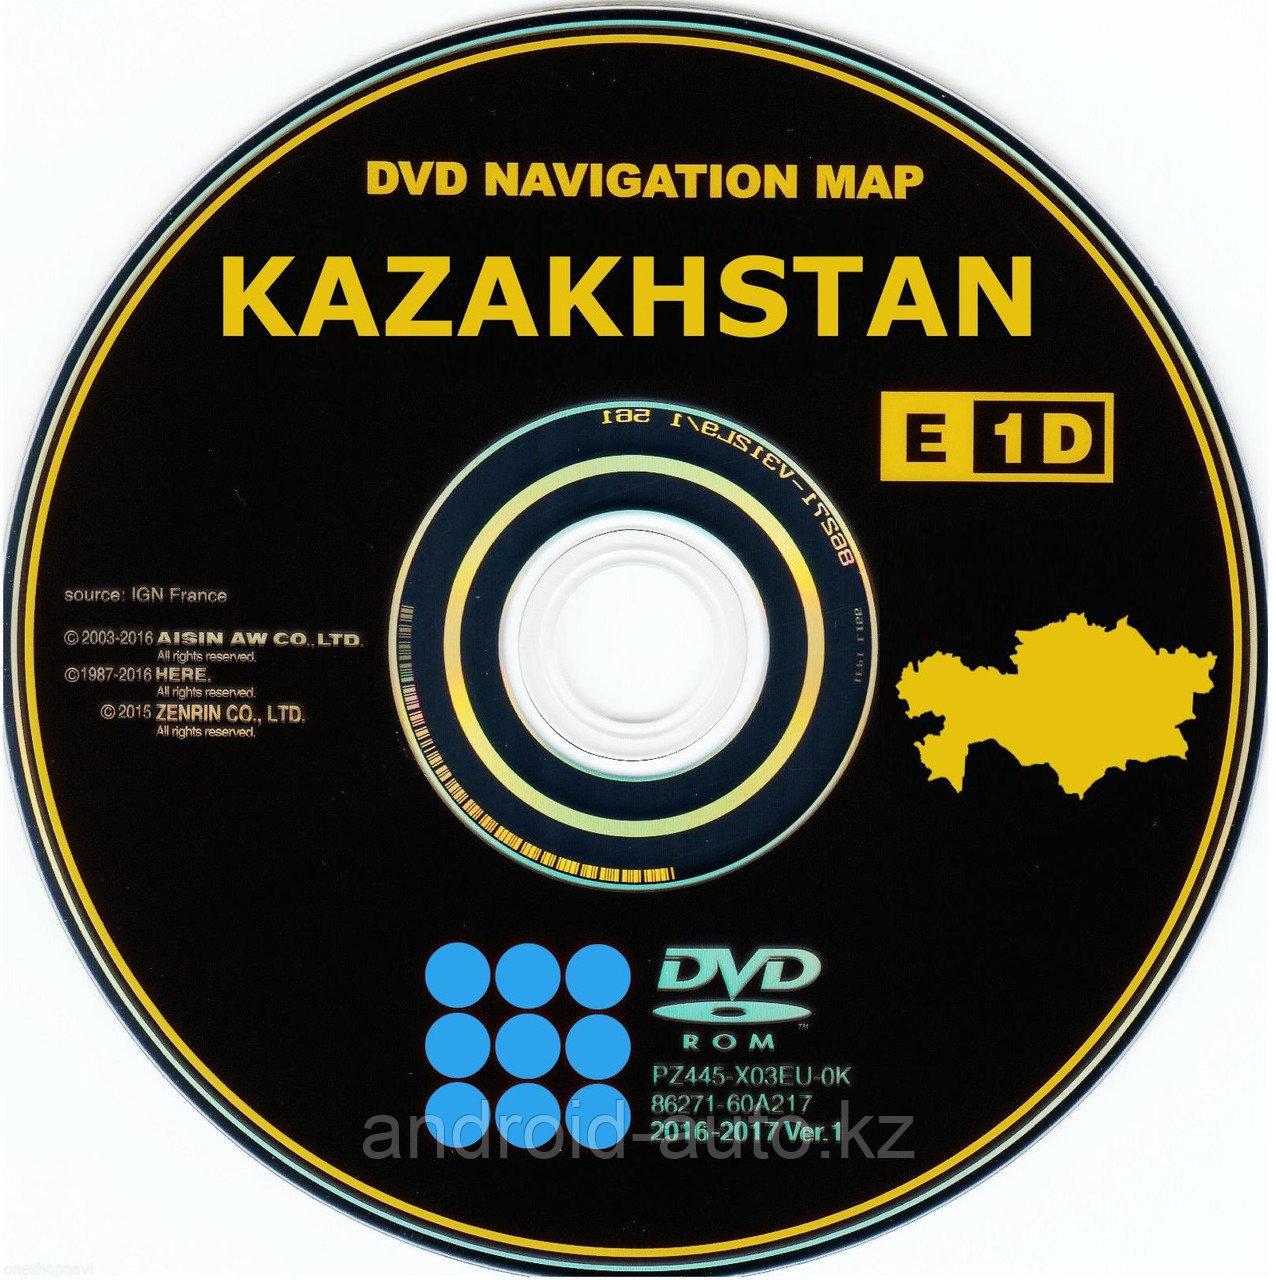 GEN-5 DVD NAVIGATION MAP of KAZAKHSTAN - (DENSO) TOYOTA LAND Cruiser 200 2007-2009